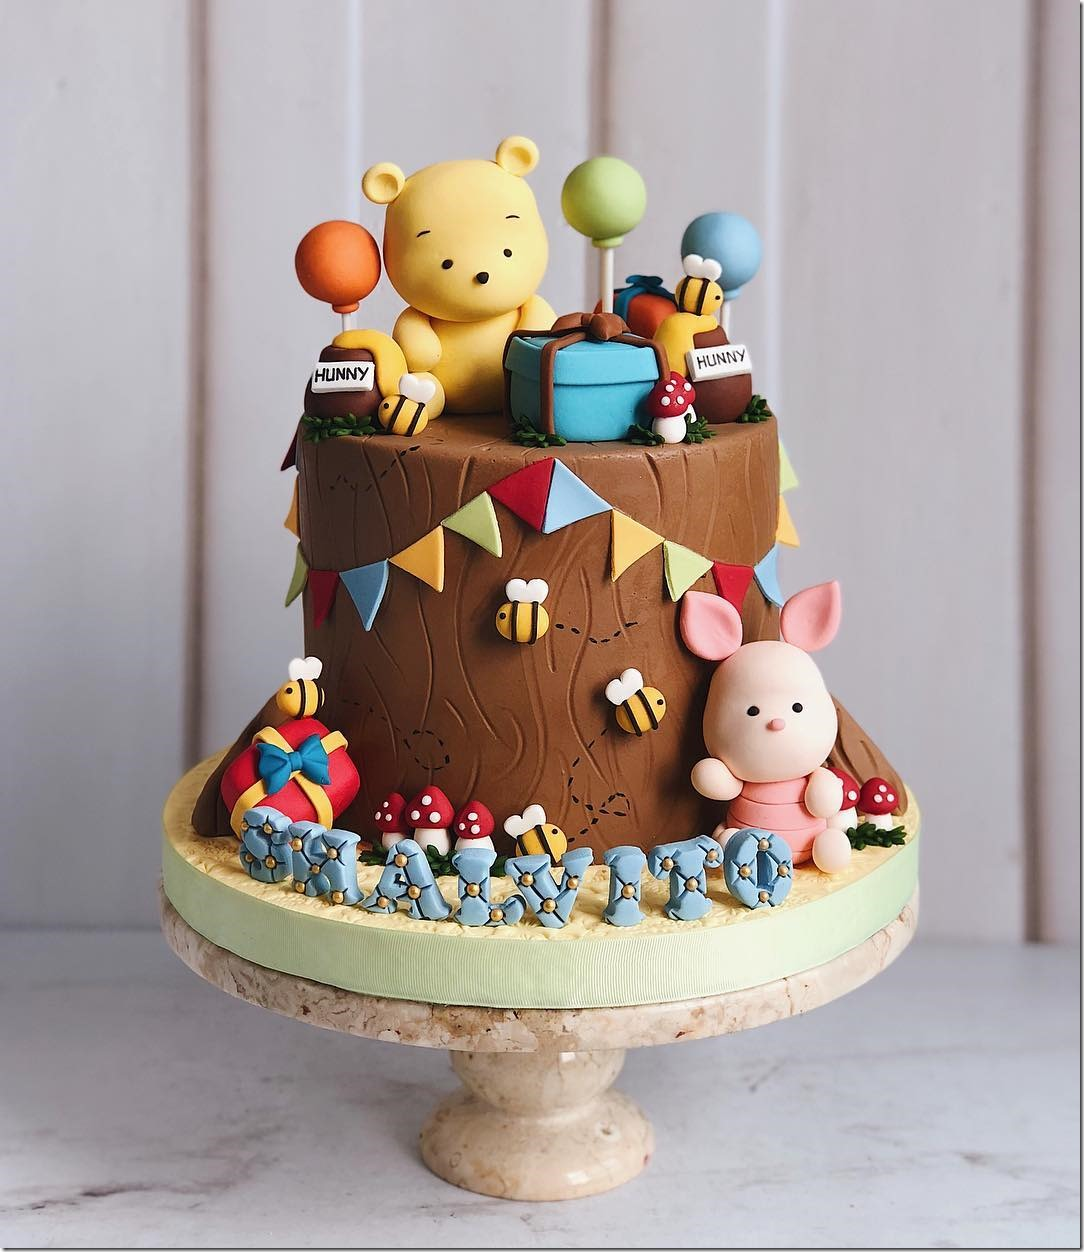 Winnie the Pooh and Piglet Birthday Cake